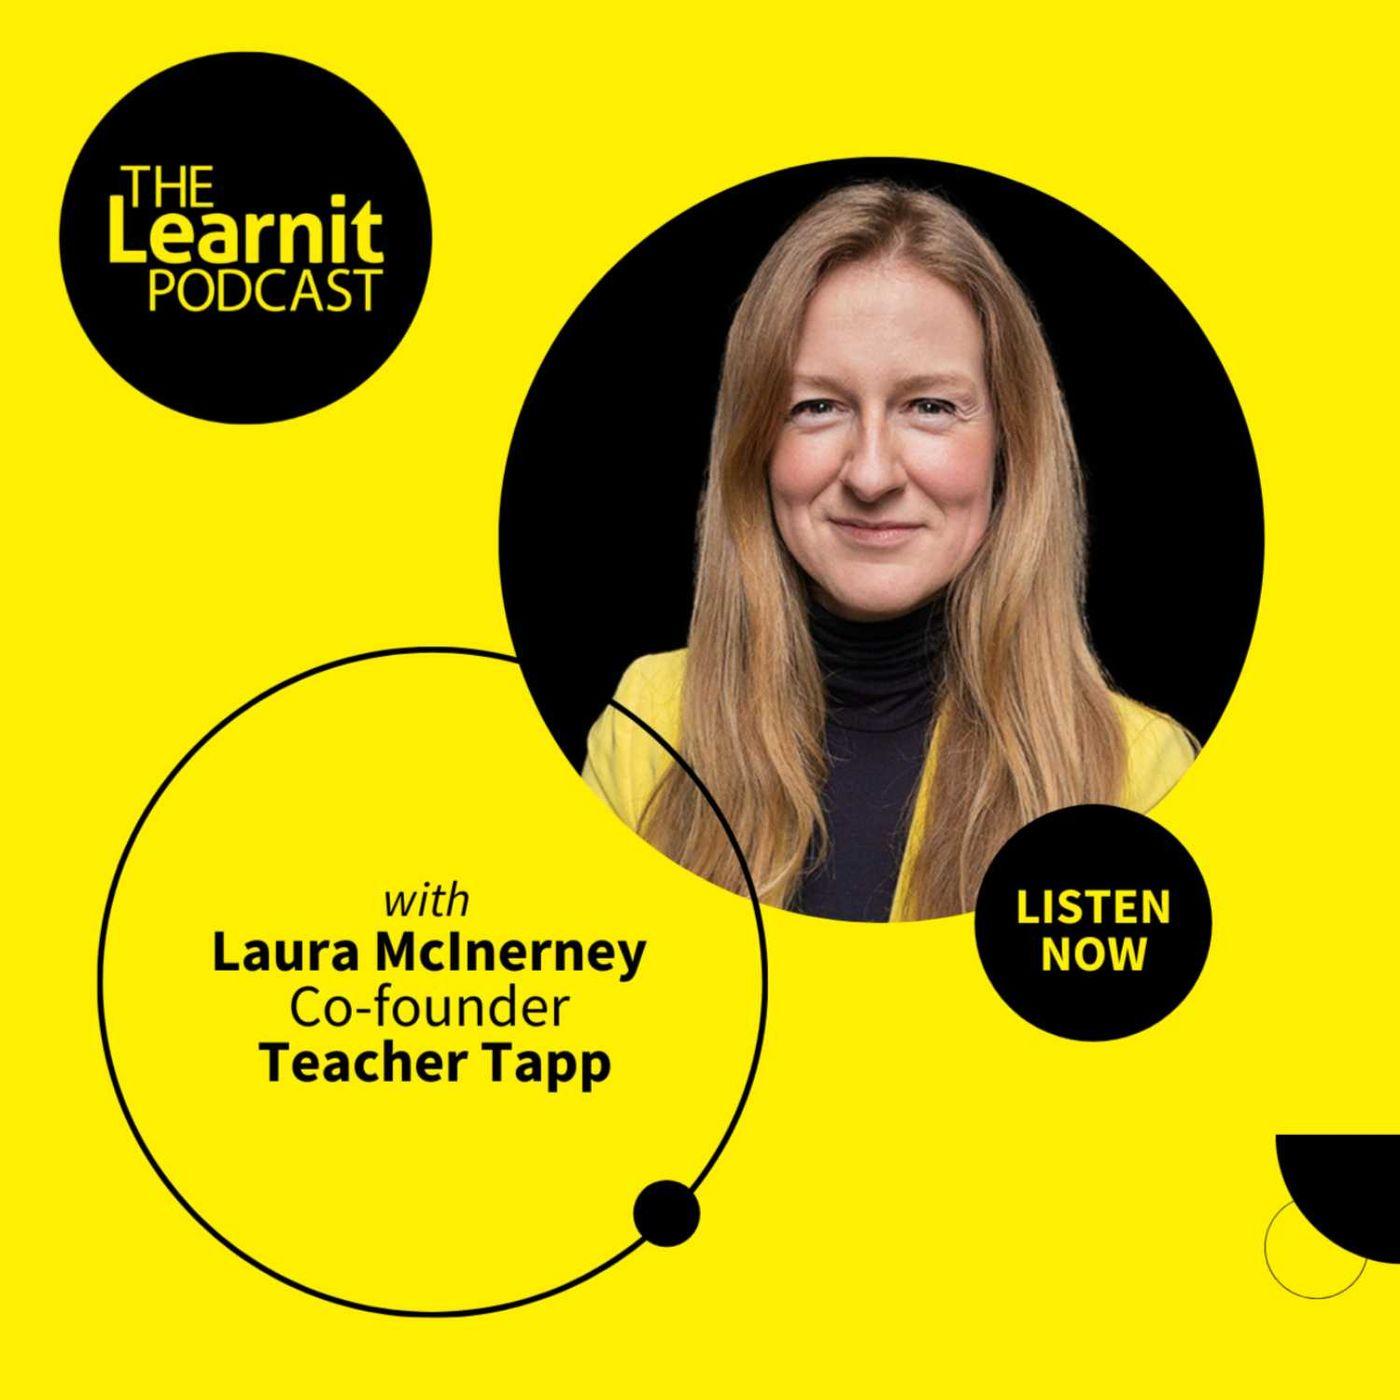 #30, Laura McInerney, Co-founder, Teacher Tapp: What We Learn When We Listen To Teachers